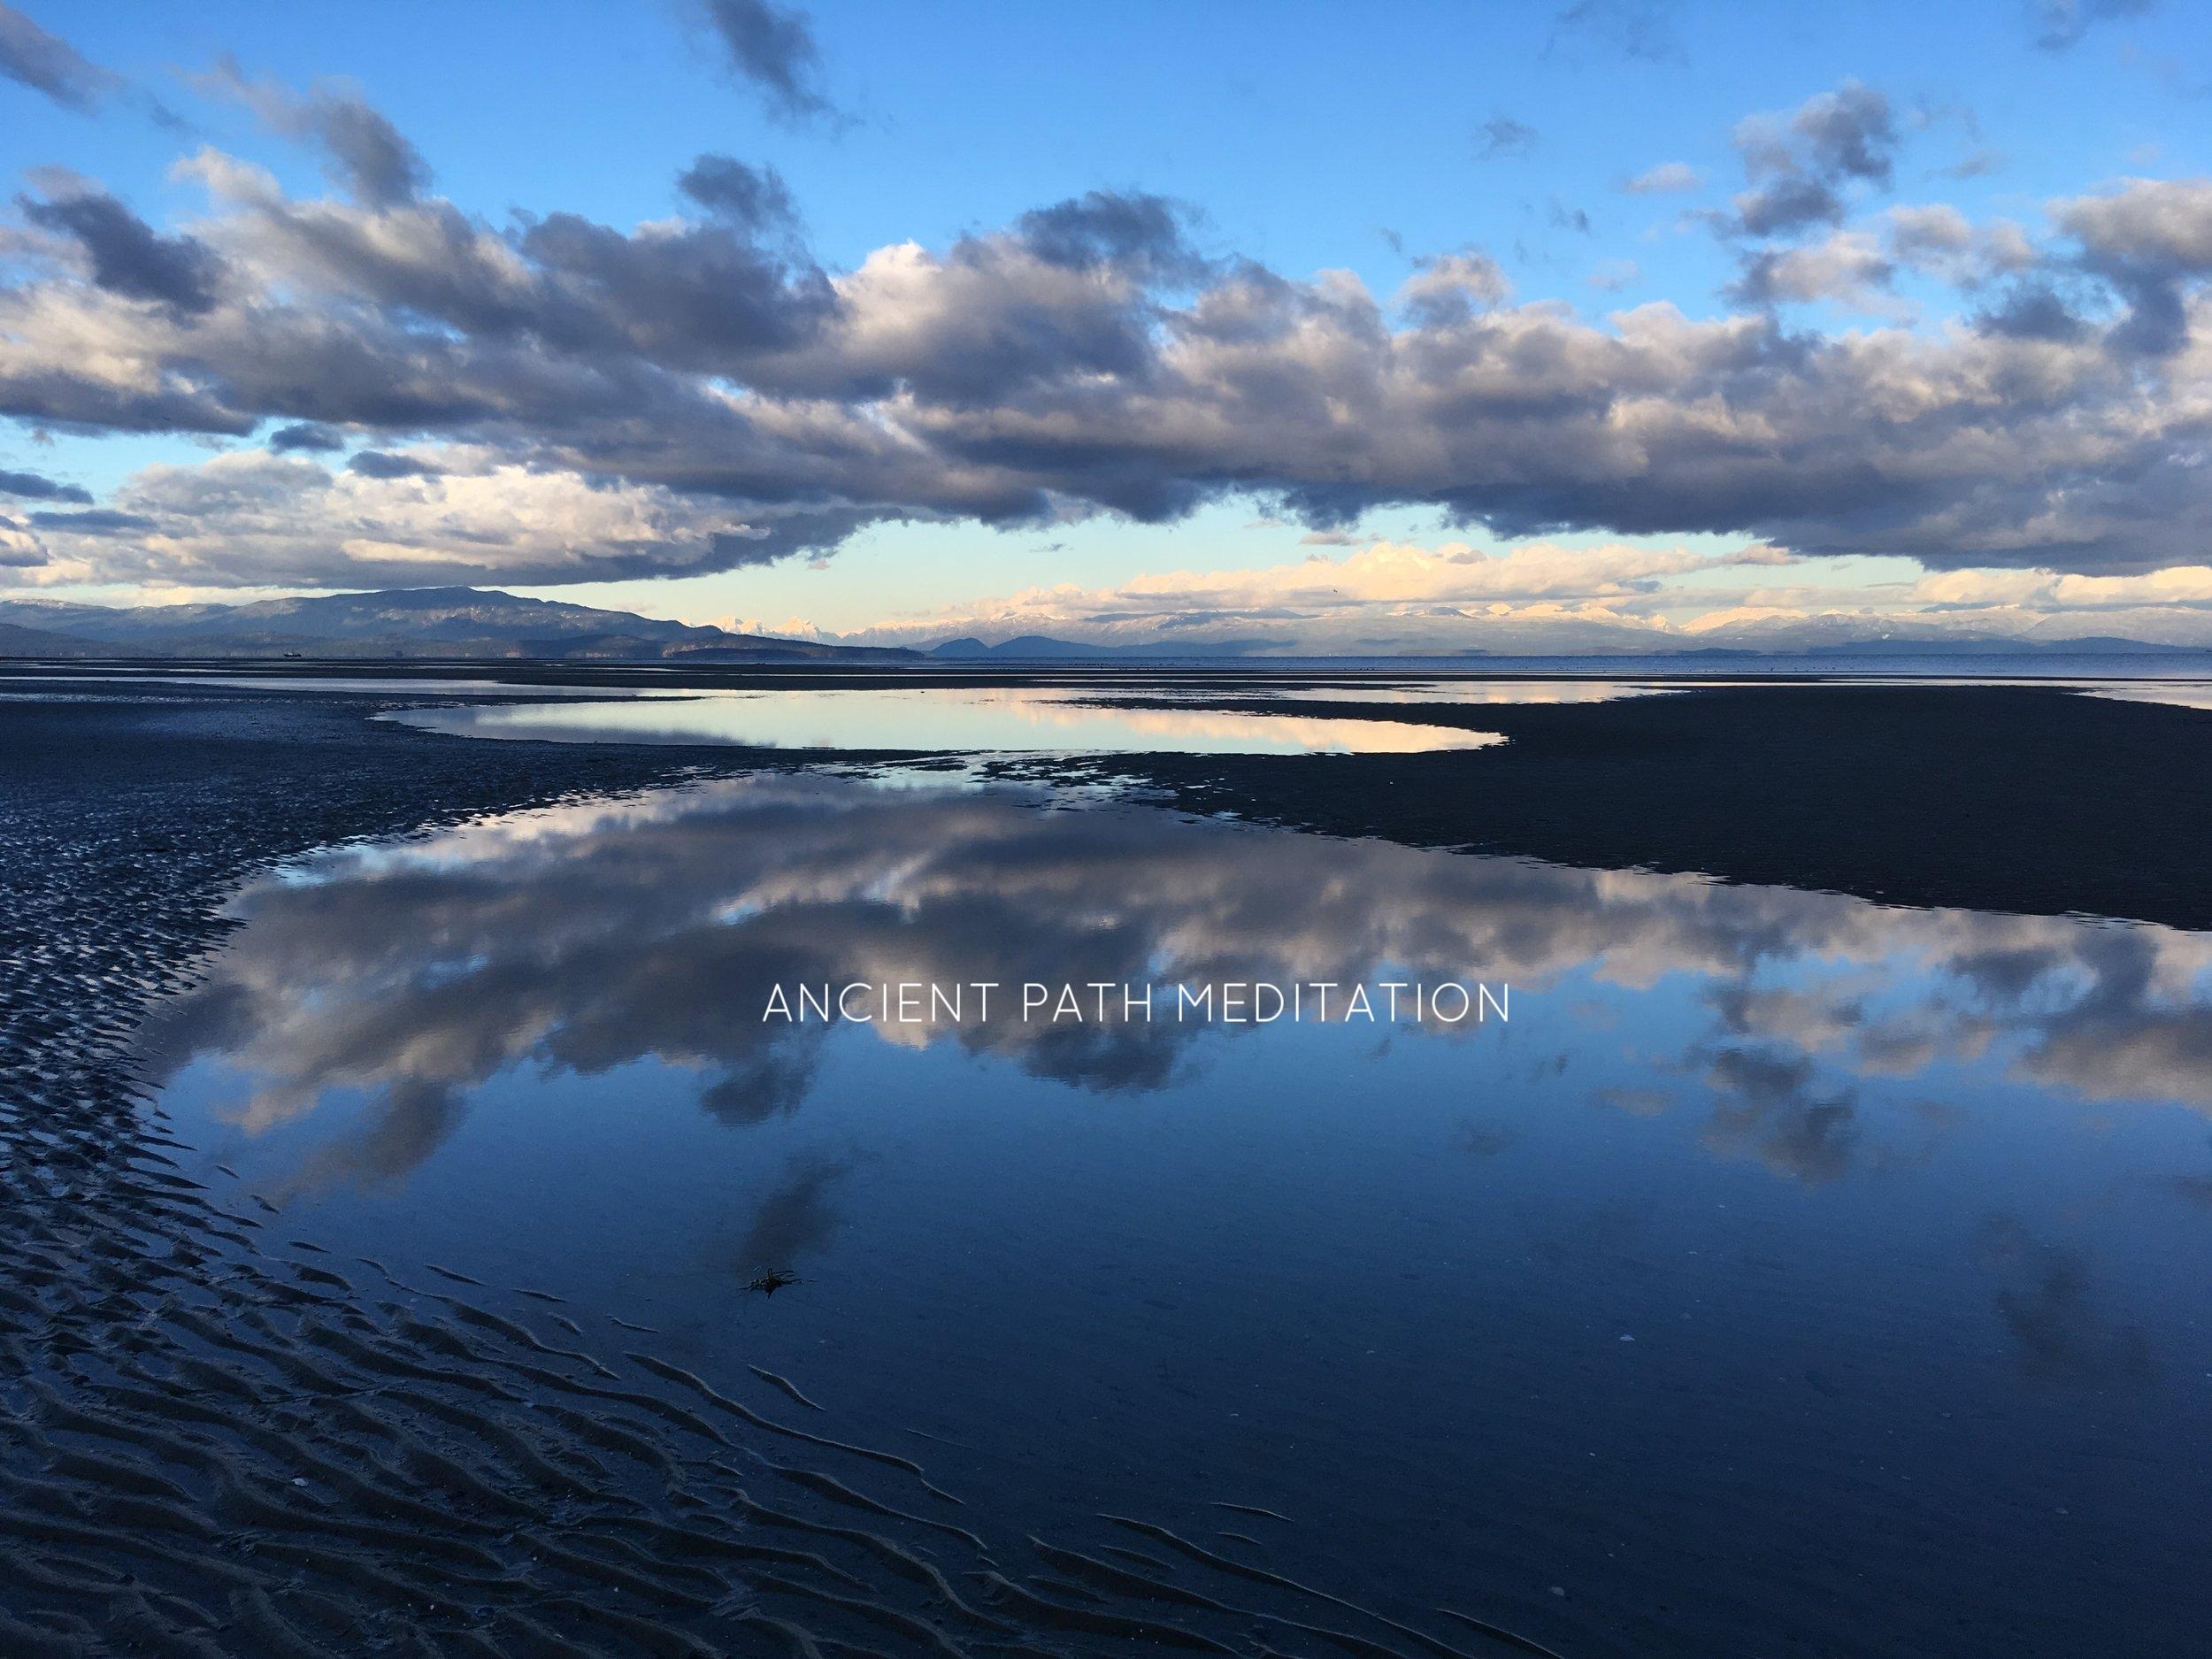 RATHTReVOR BEACH - LISA BURNESS PHOTOGRAPHY